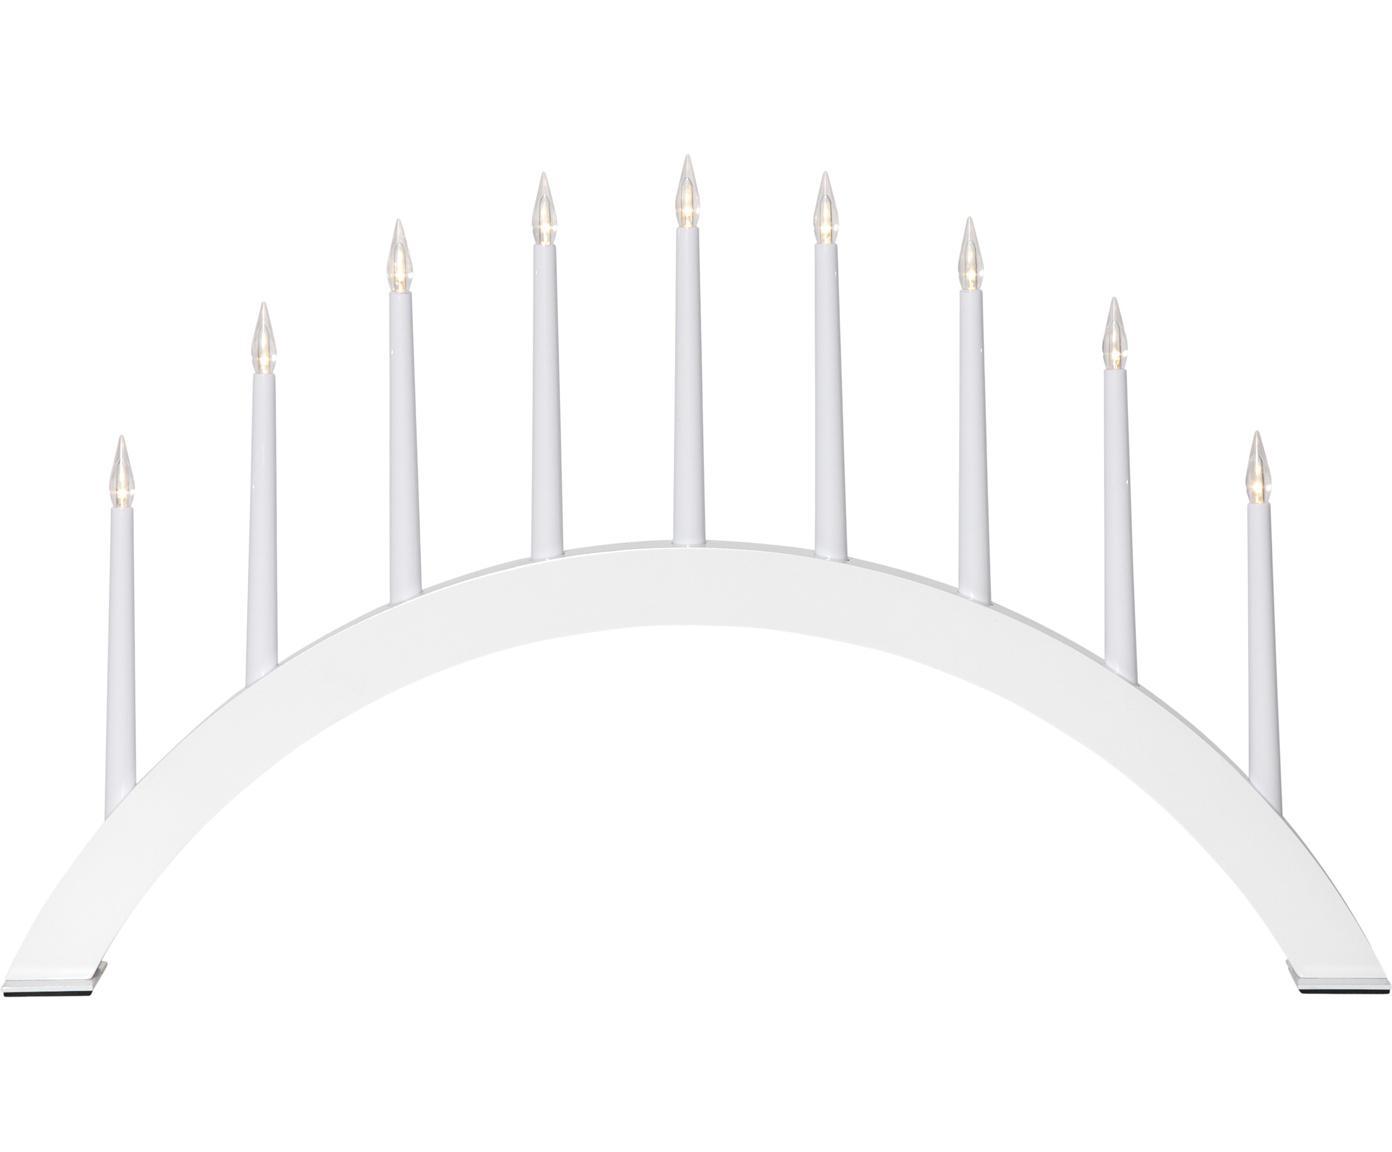 Oggetto luminoso con spina Jazz, Bianco, Larg. 53 x Alt. 32 cm